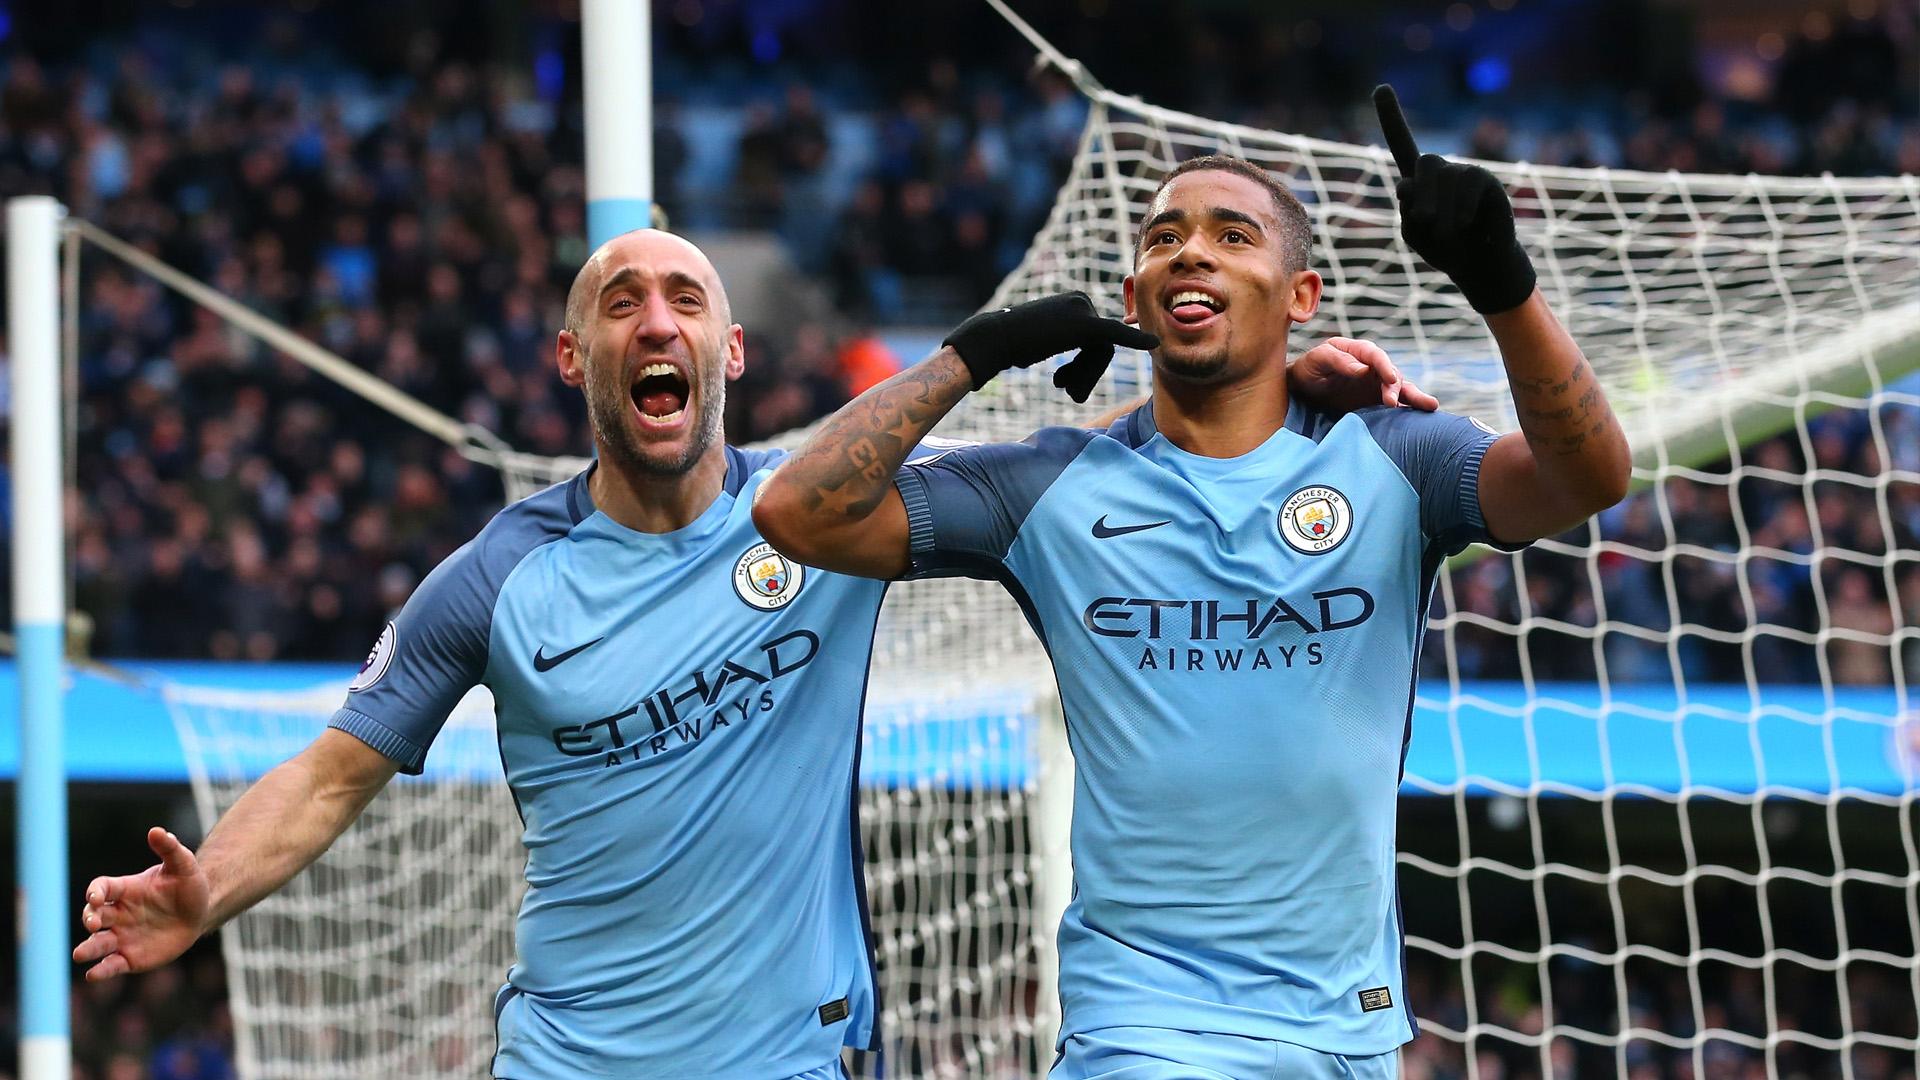 Manchester City v Swansea City - Premier League | eLan Property Group